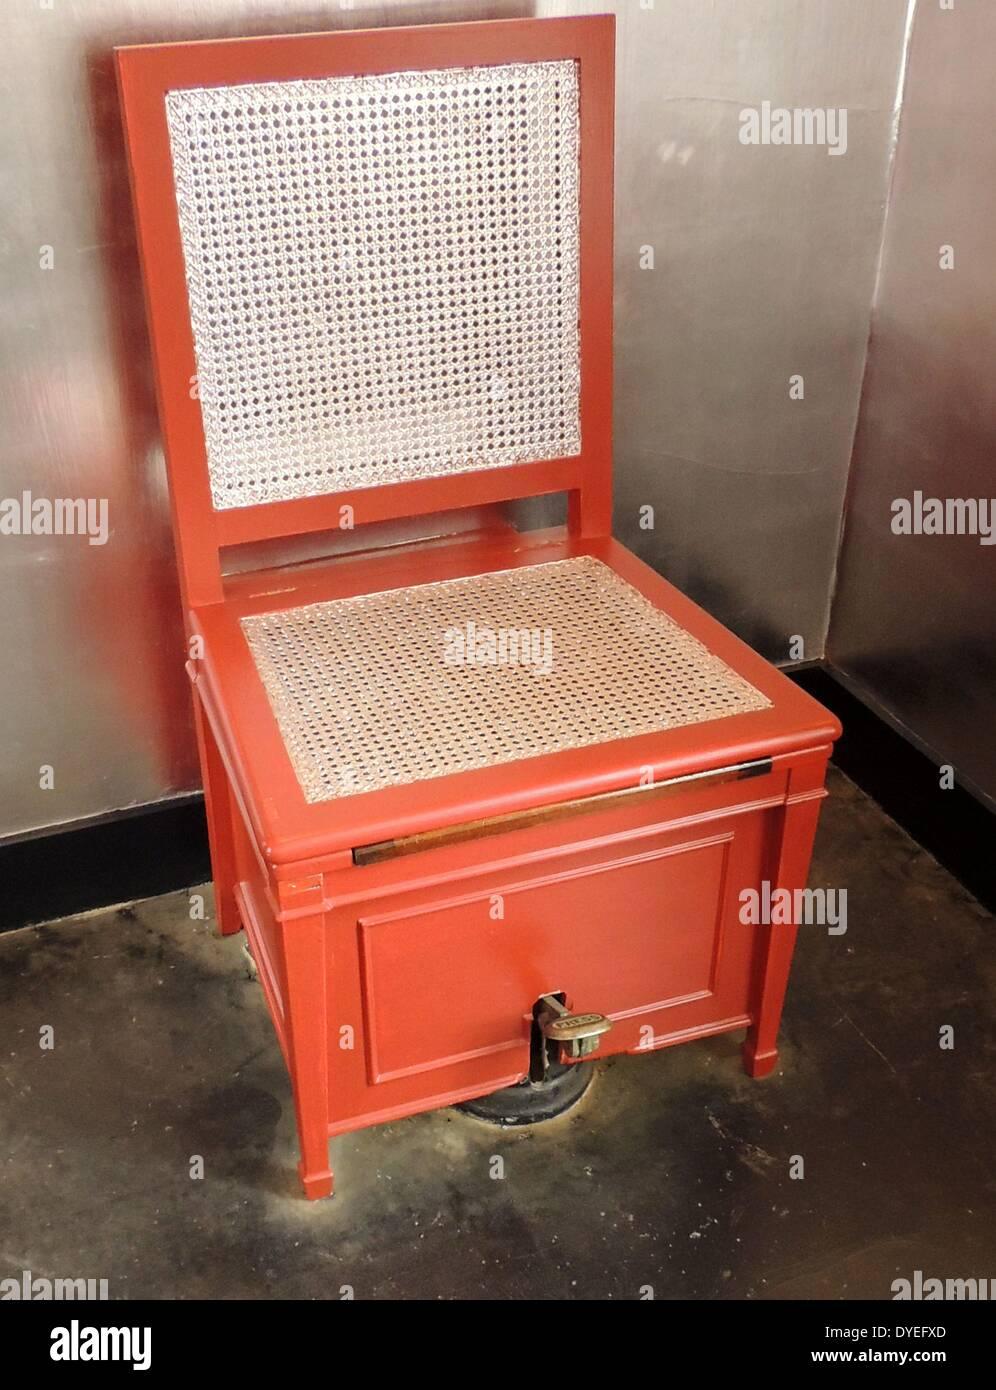 rot lackierte toilette im art-déco-badezimmer 2013 a.d stockfoto, Badezimmer ideen